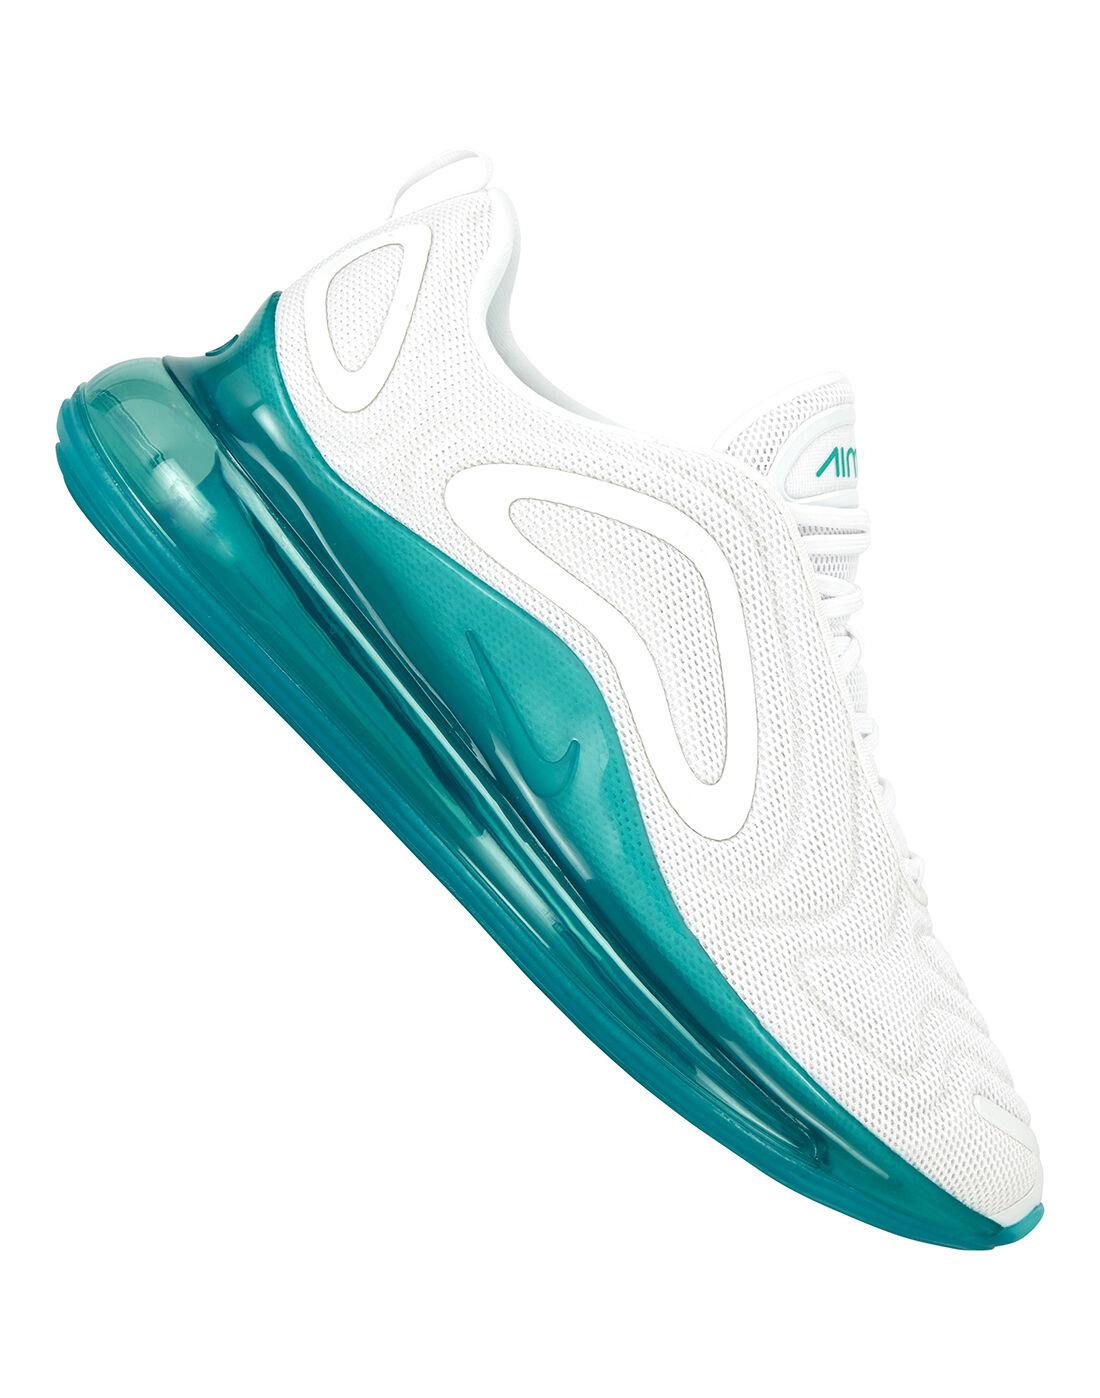 Men's White \u0026 Blue Nike Air Max 720